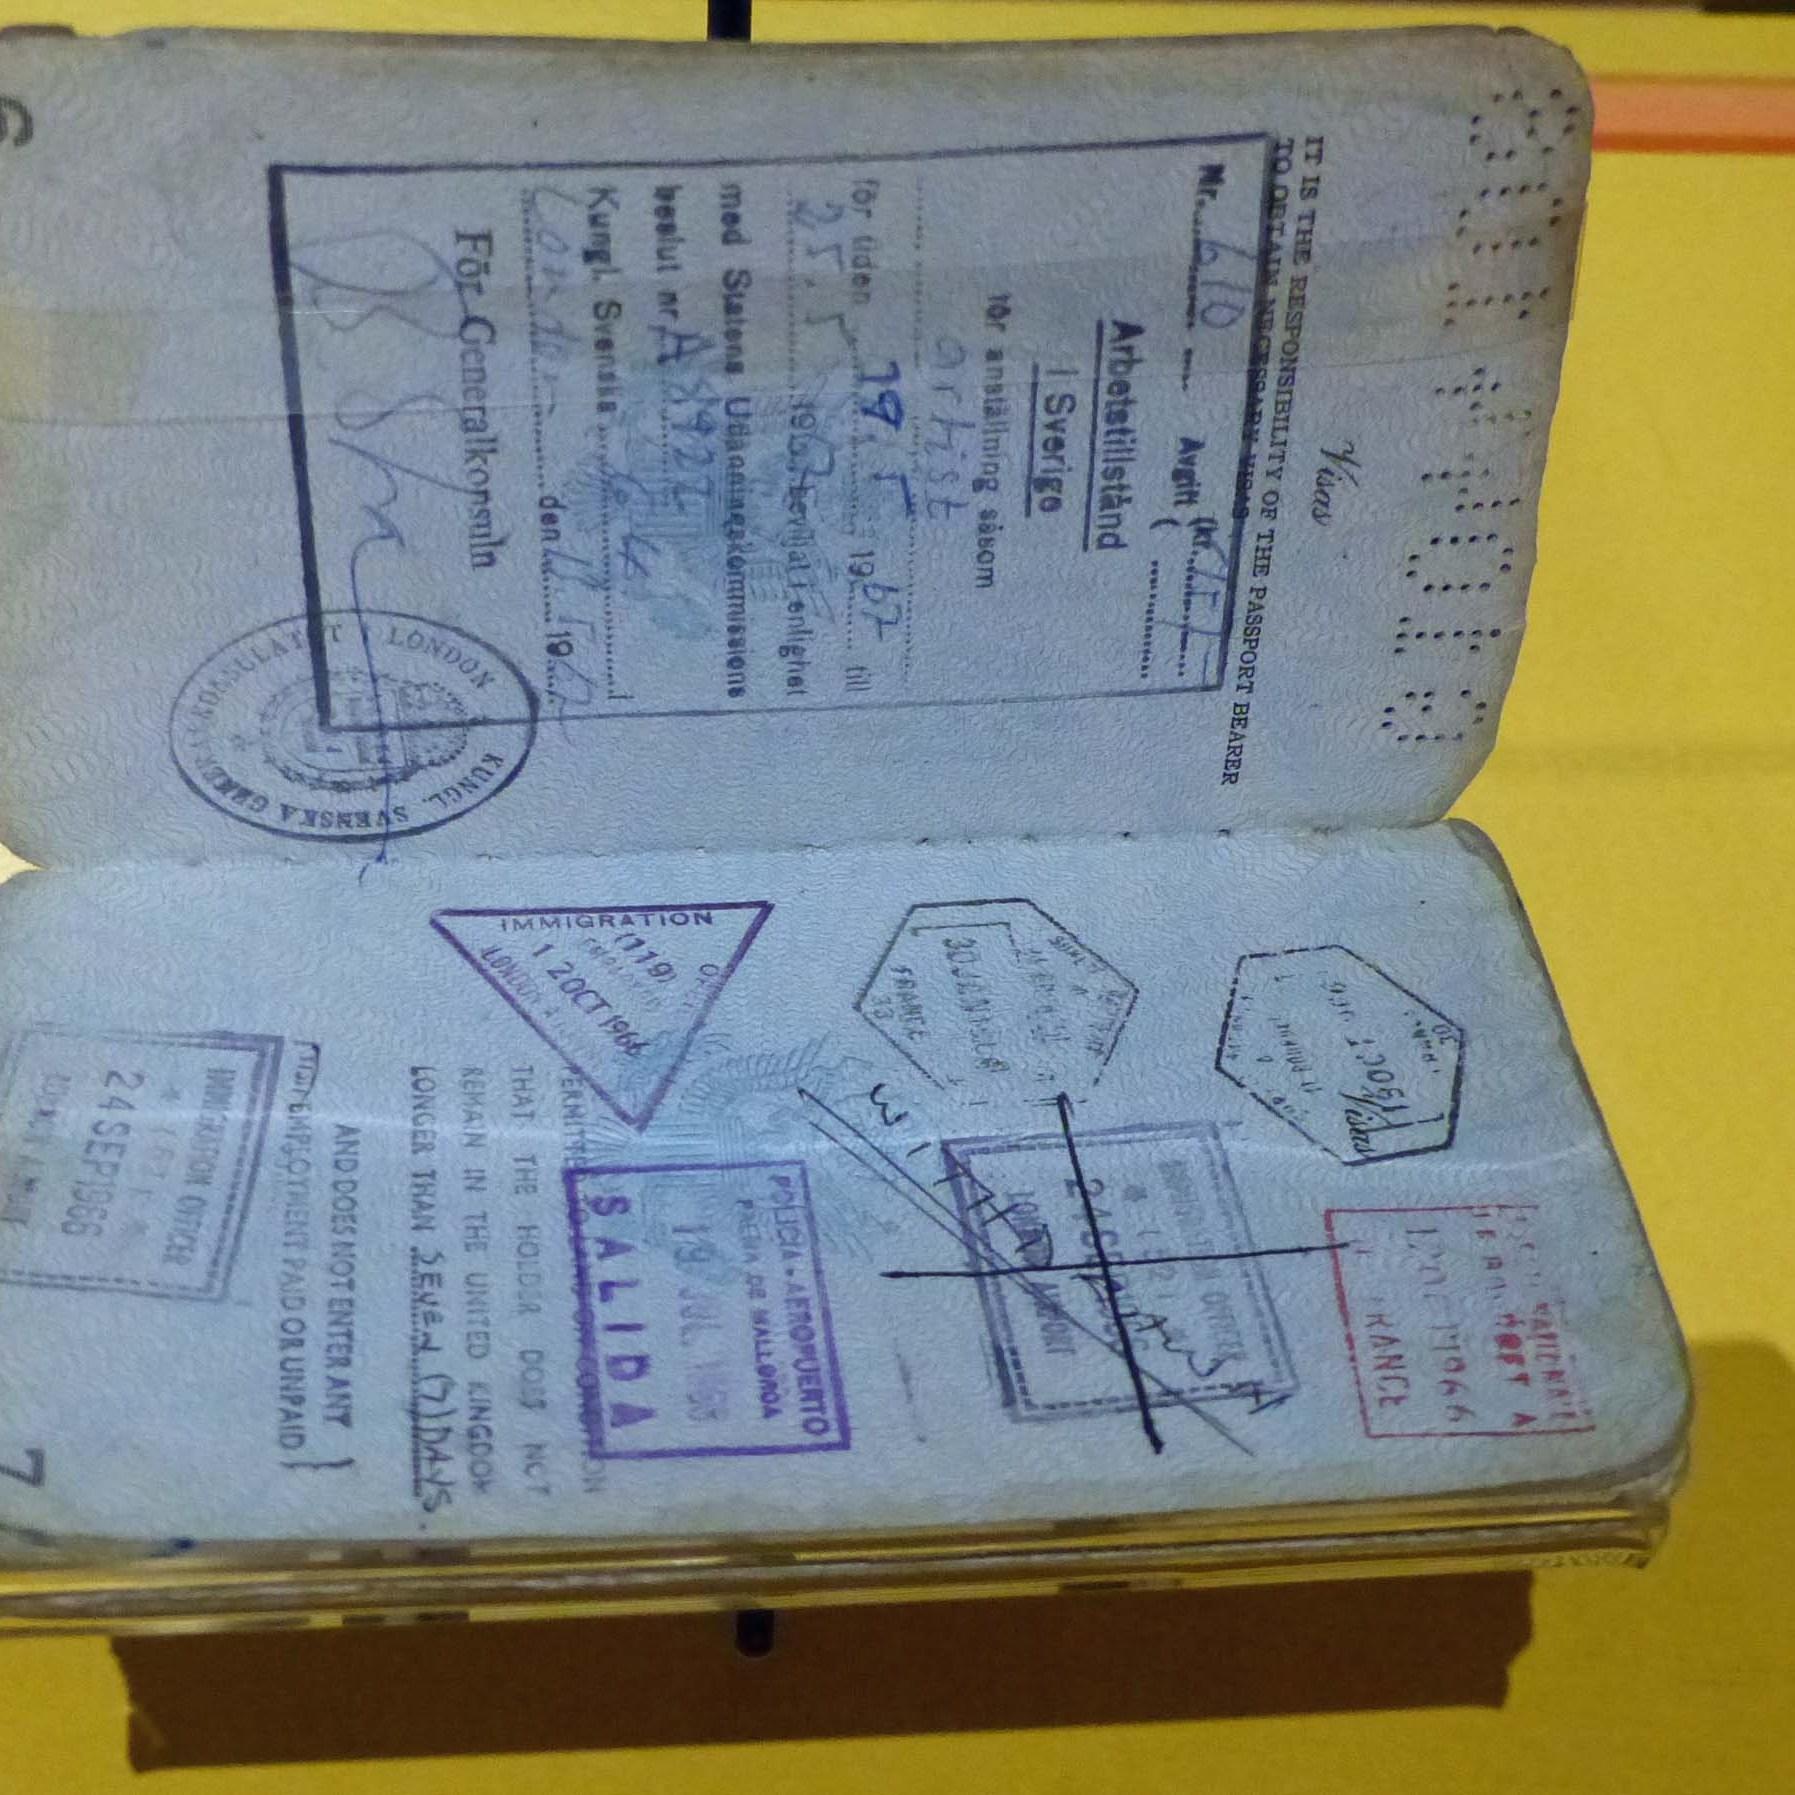 Open passport in a glass cabinet